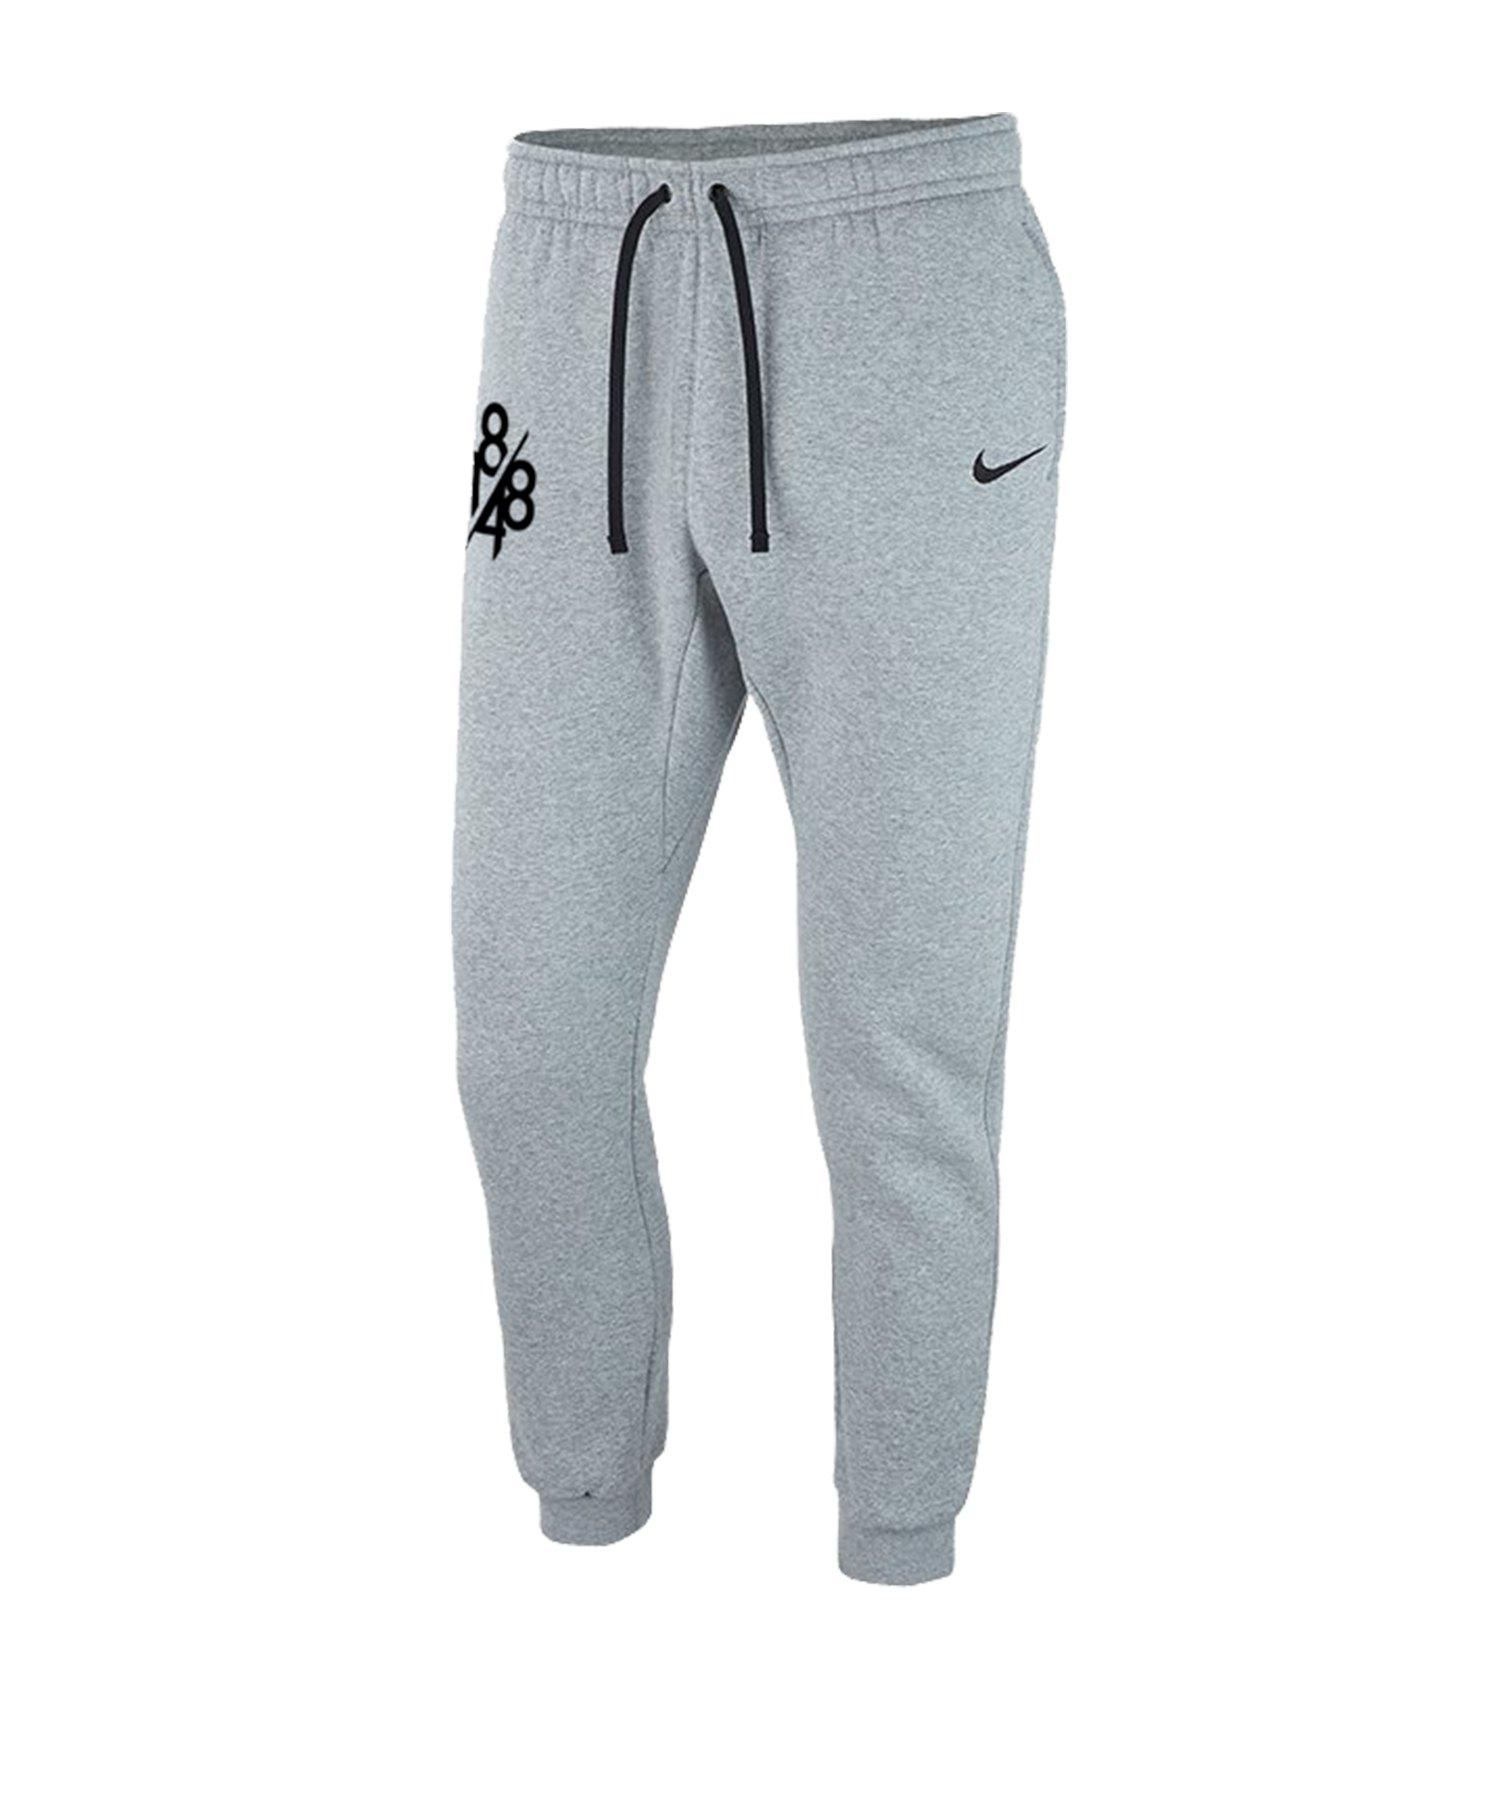 Nike VfL Bochum Jogginghose Grau F063 - grau